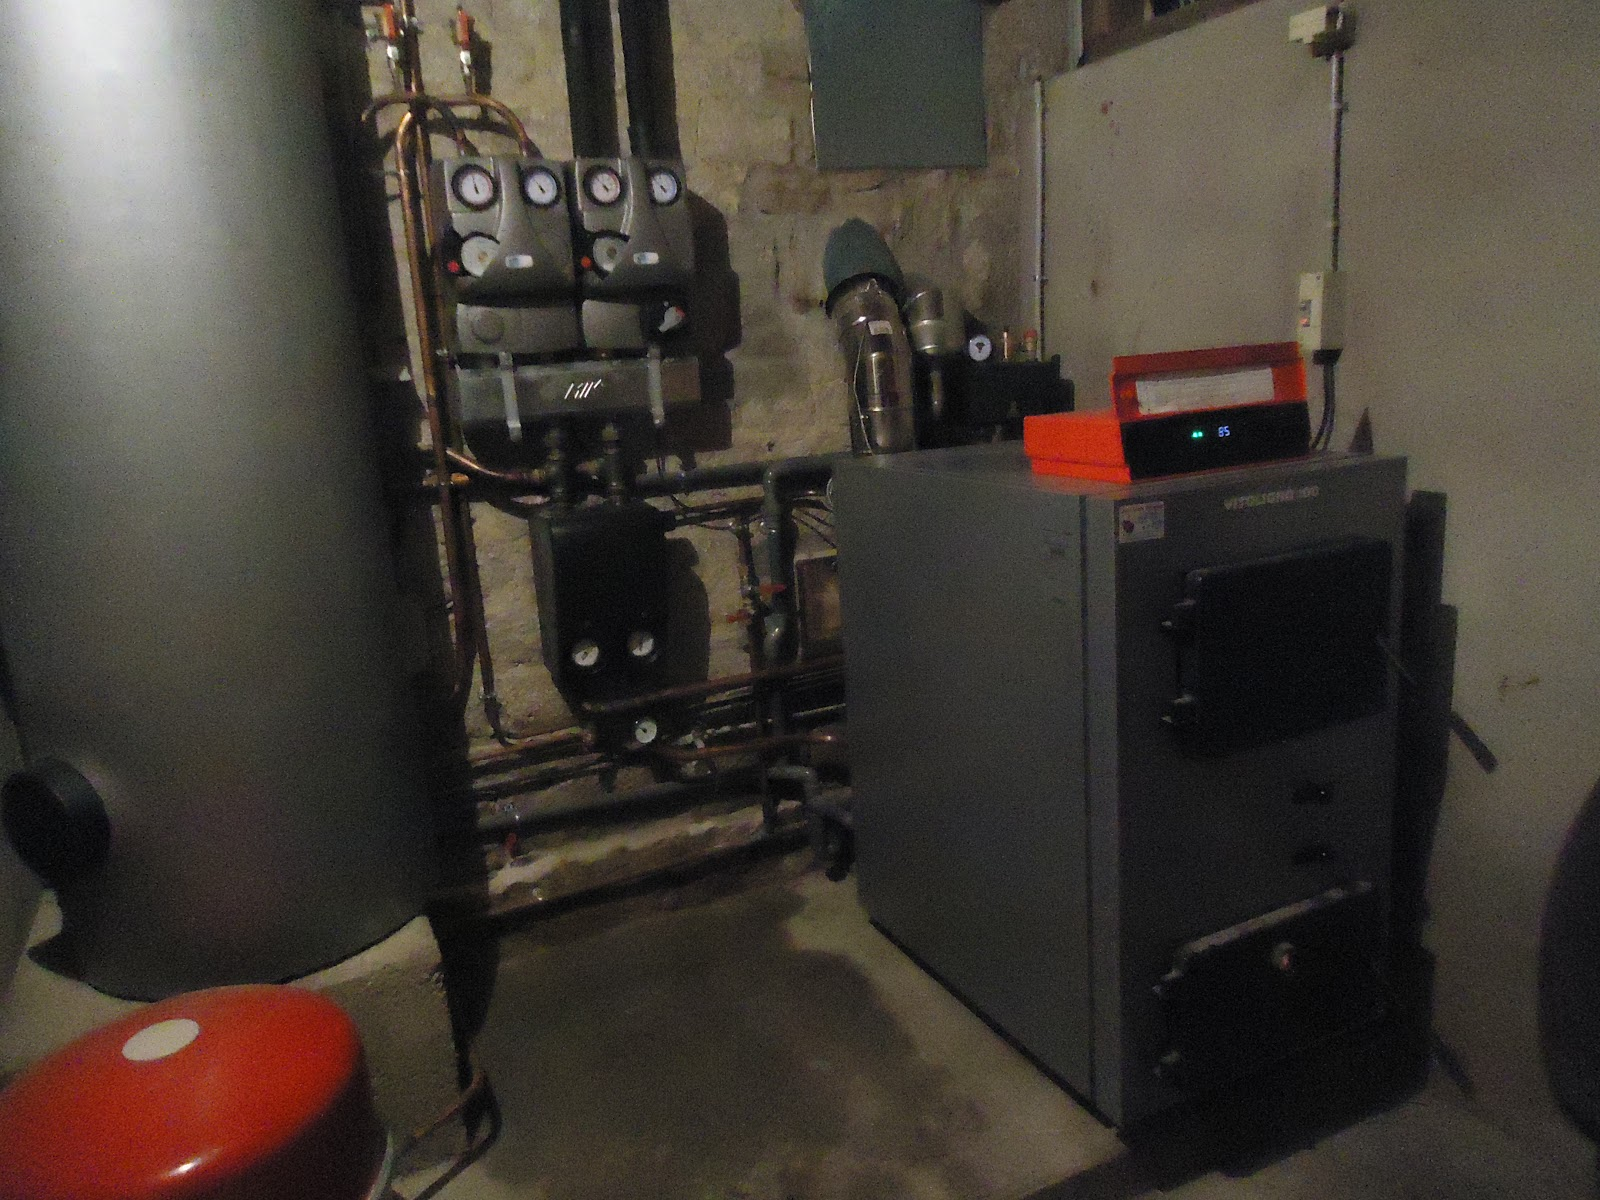 Radiateur salle de bain eau chaude for Chauffage salle de bain castorama